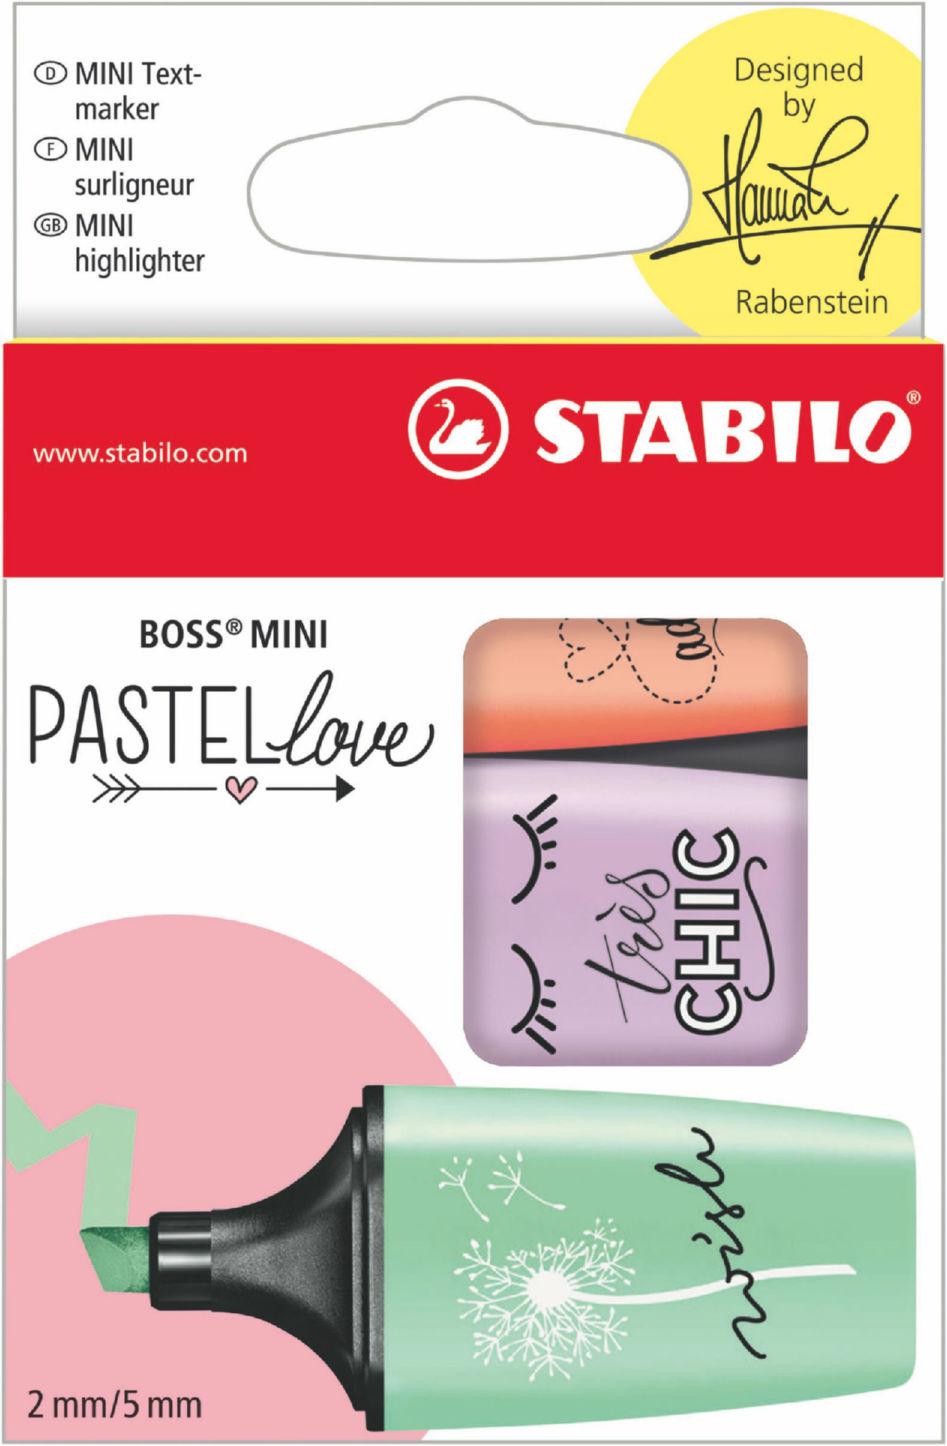 Highlighters Stabilo BOSS MINI Pastellove Highlighters PK3